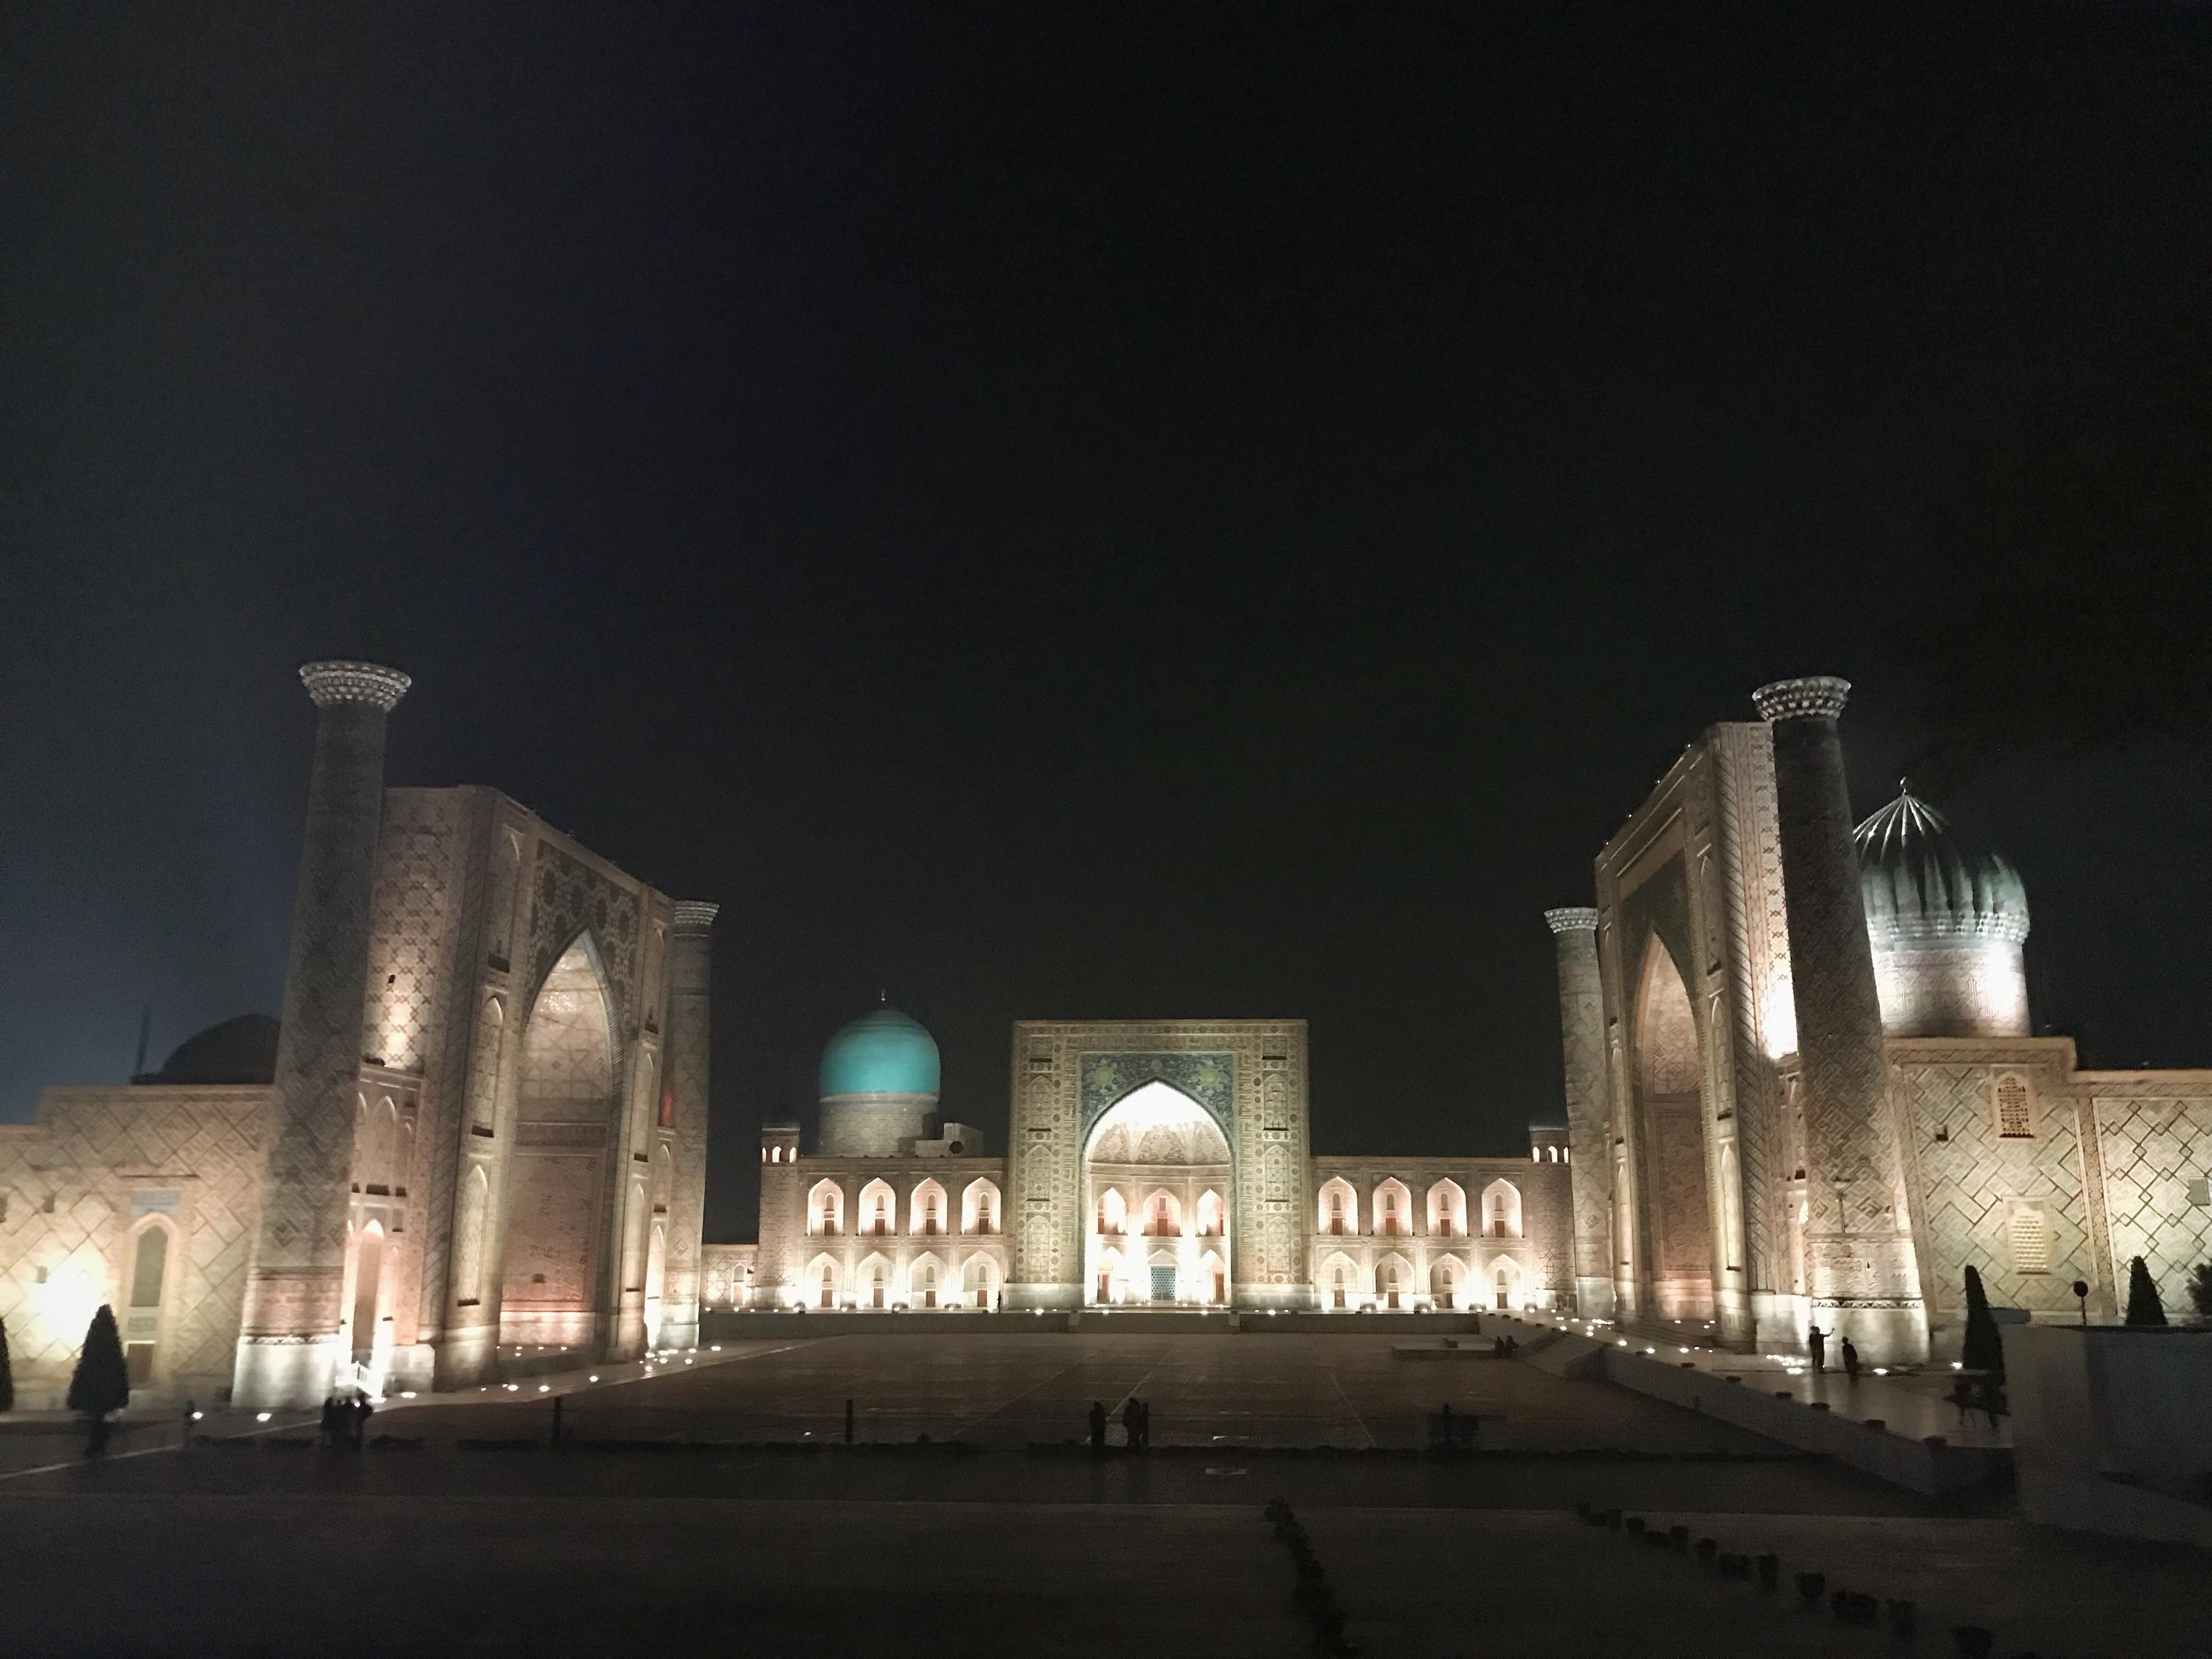 Usbekistand kscheib Registan Nacht Samarkand